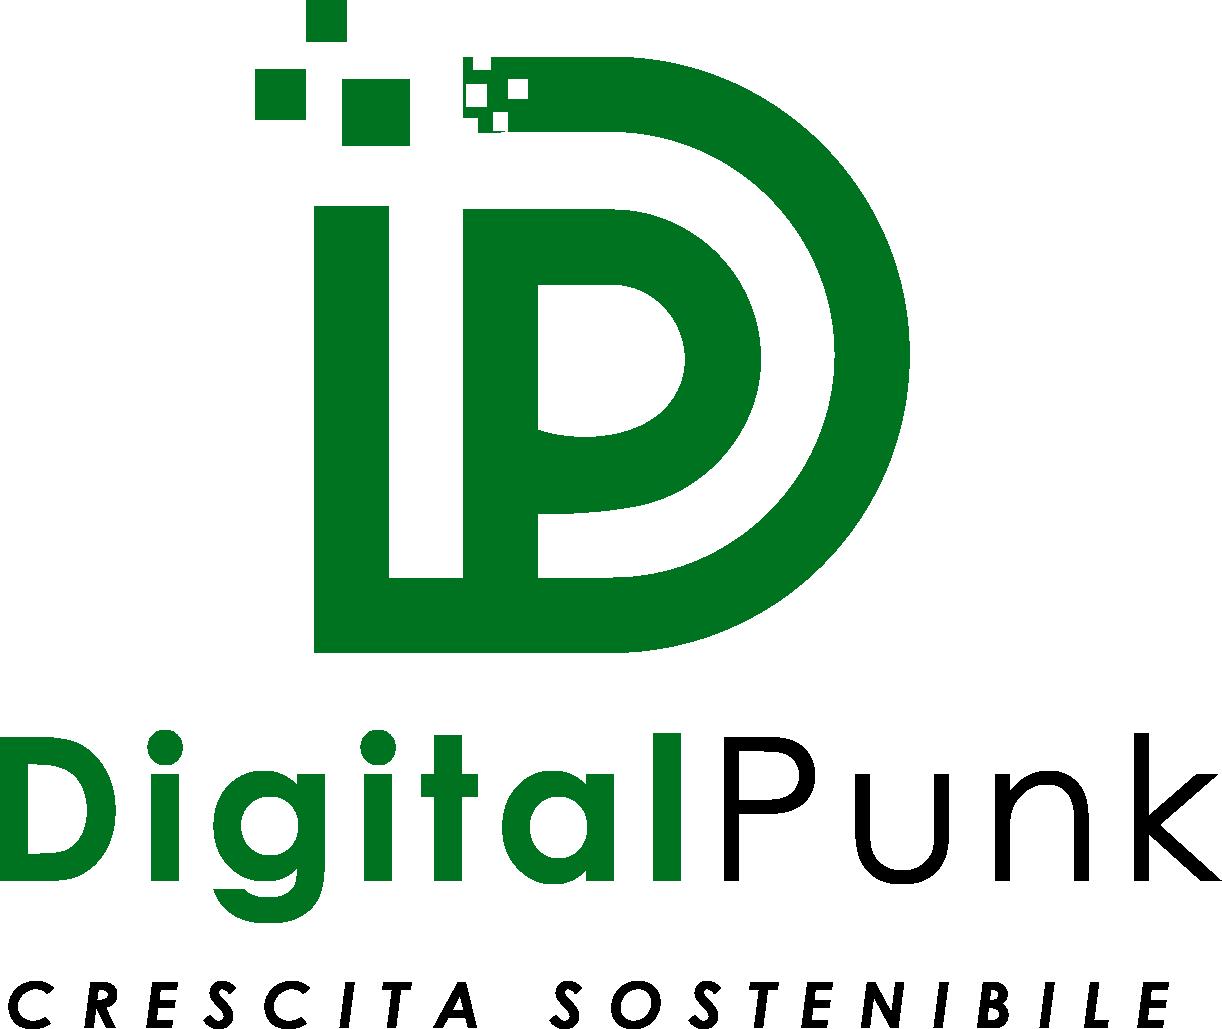 Digital Punk